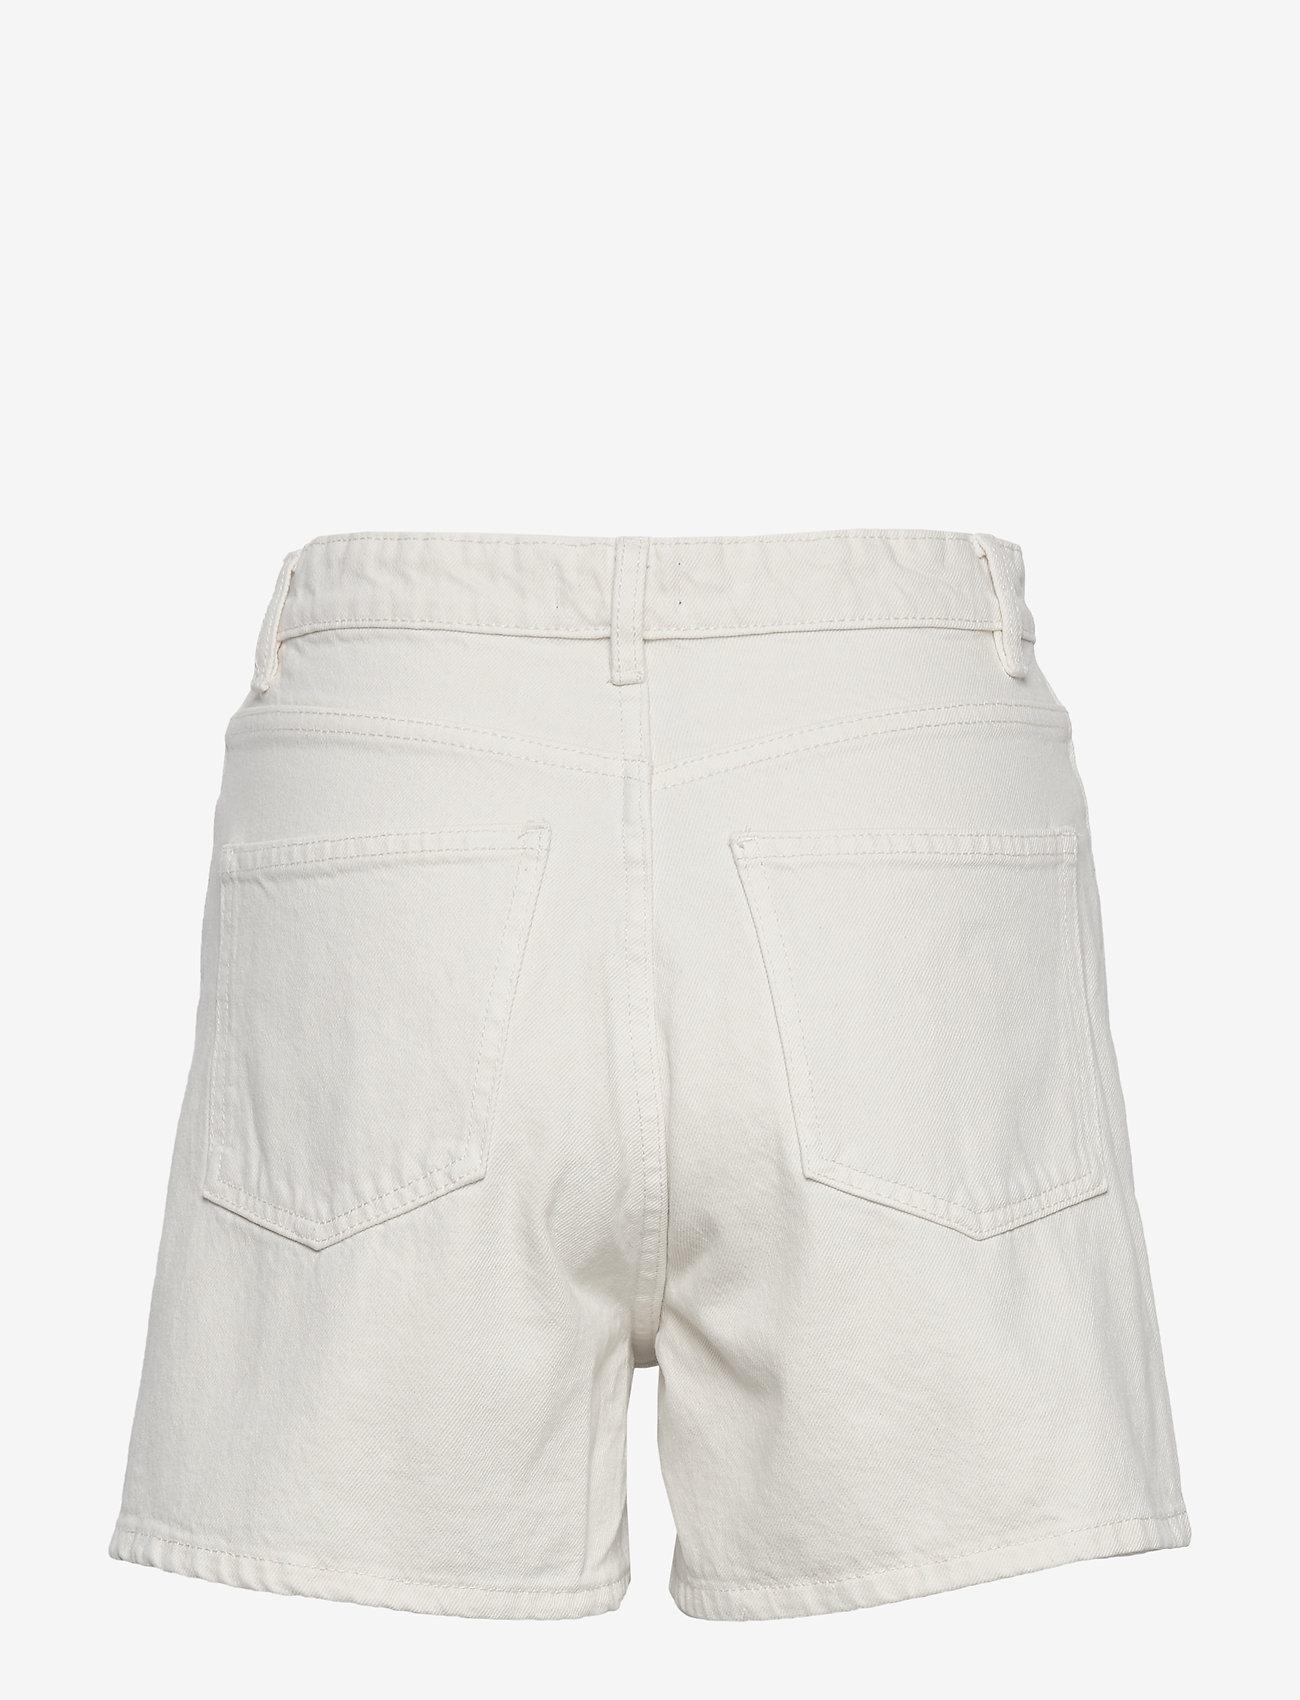 Shorts Naomi White (Off White) - Lindex 9Uyt4h